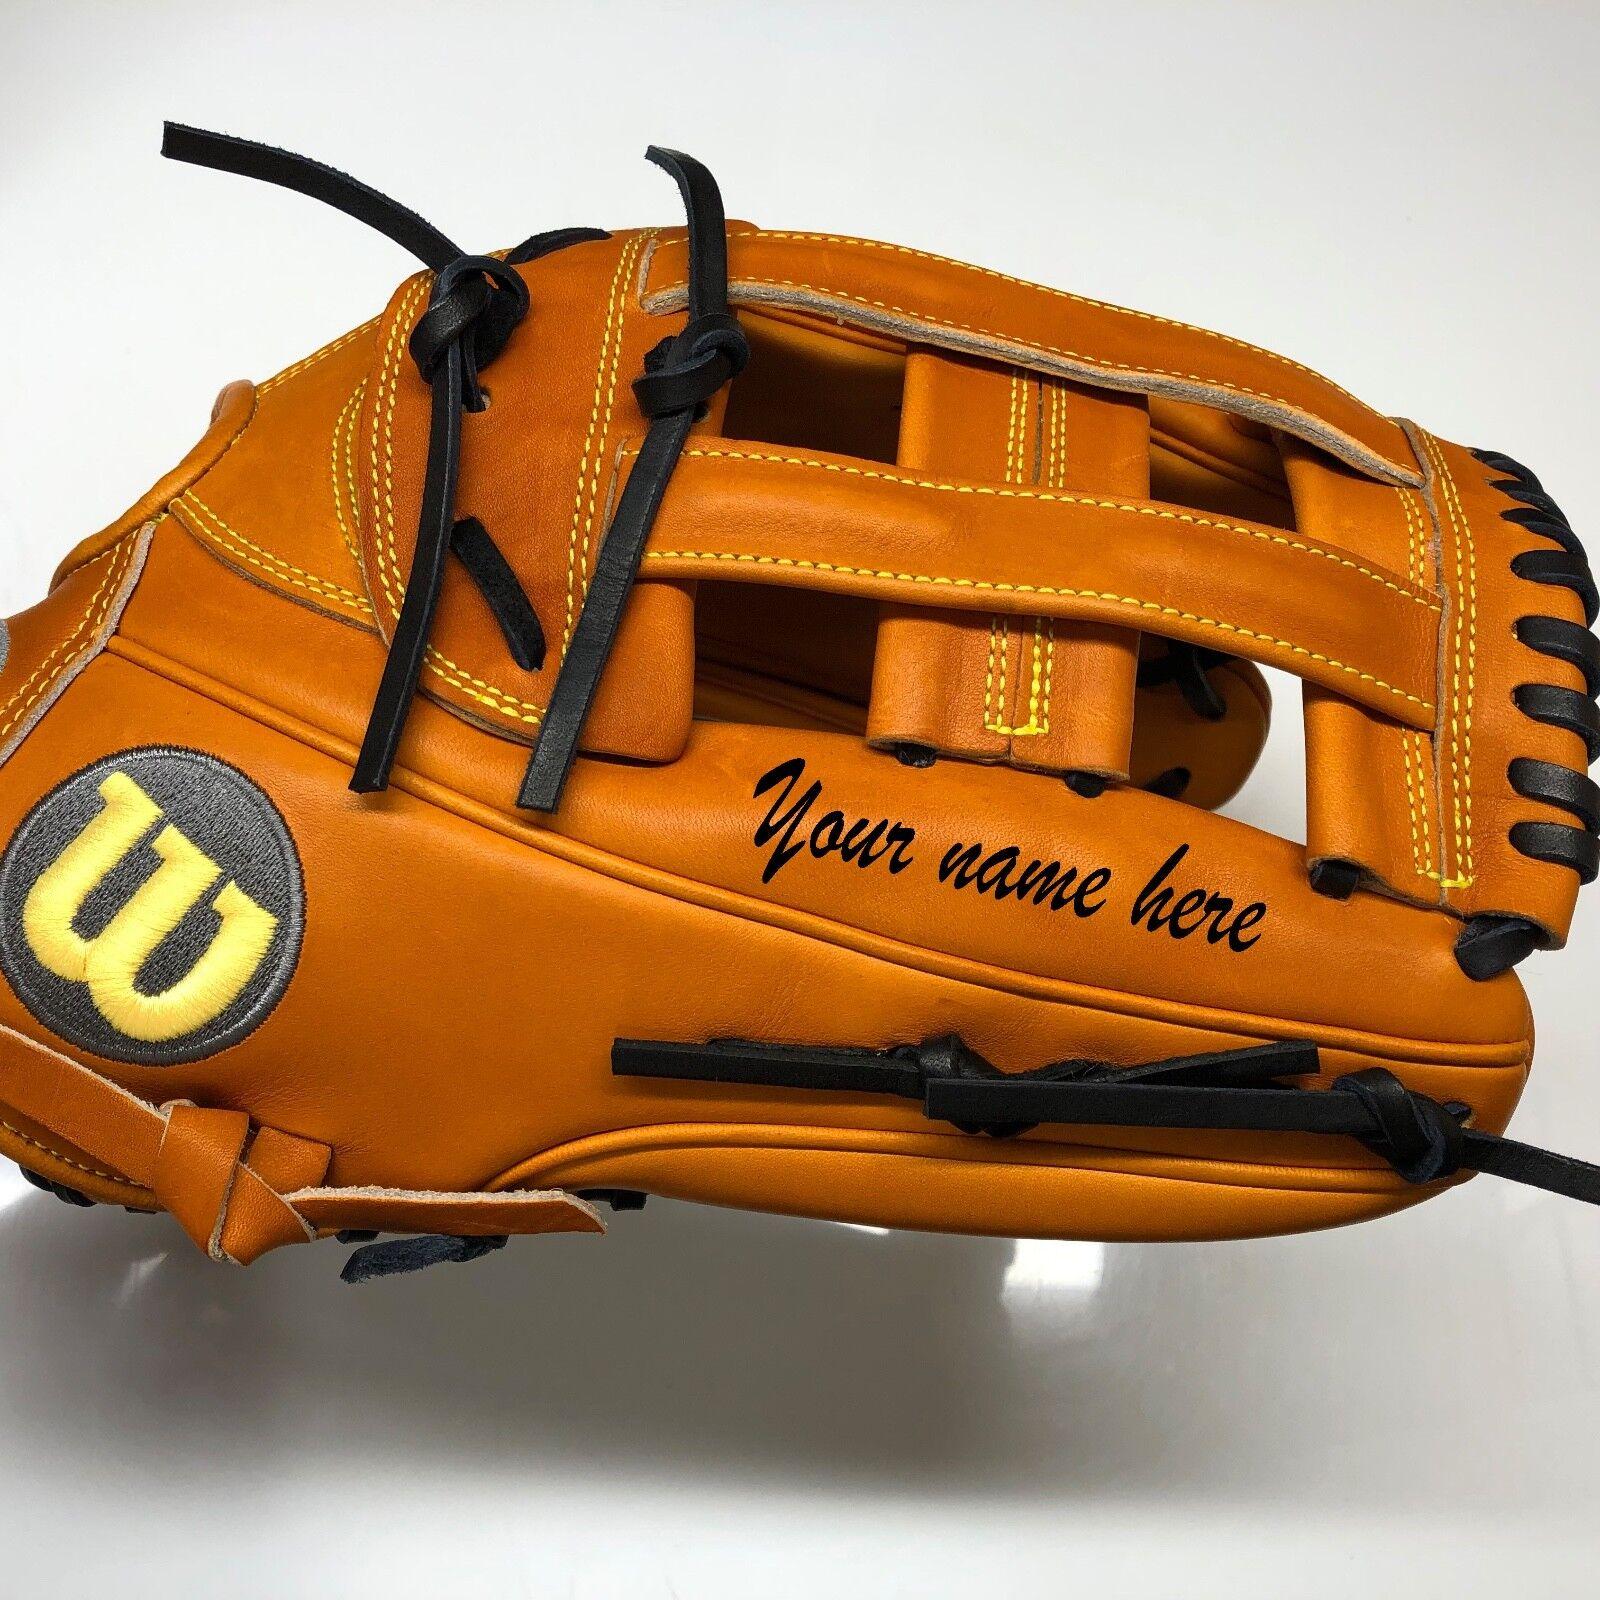 Wilson A2000 1799 12.75  Guante de béisbol  nombre Grabado Gratis.